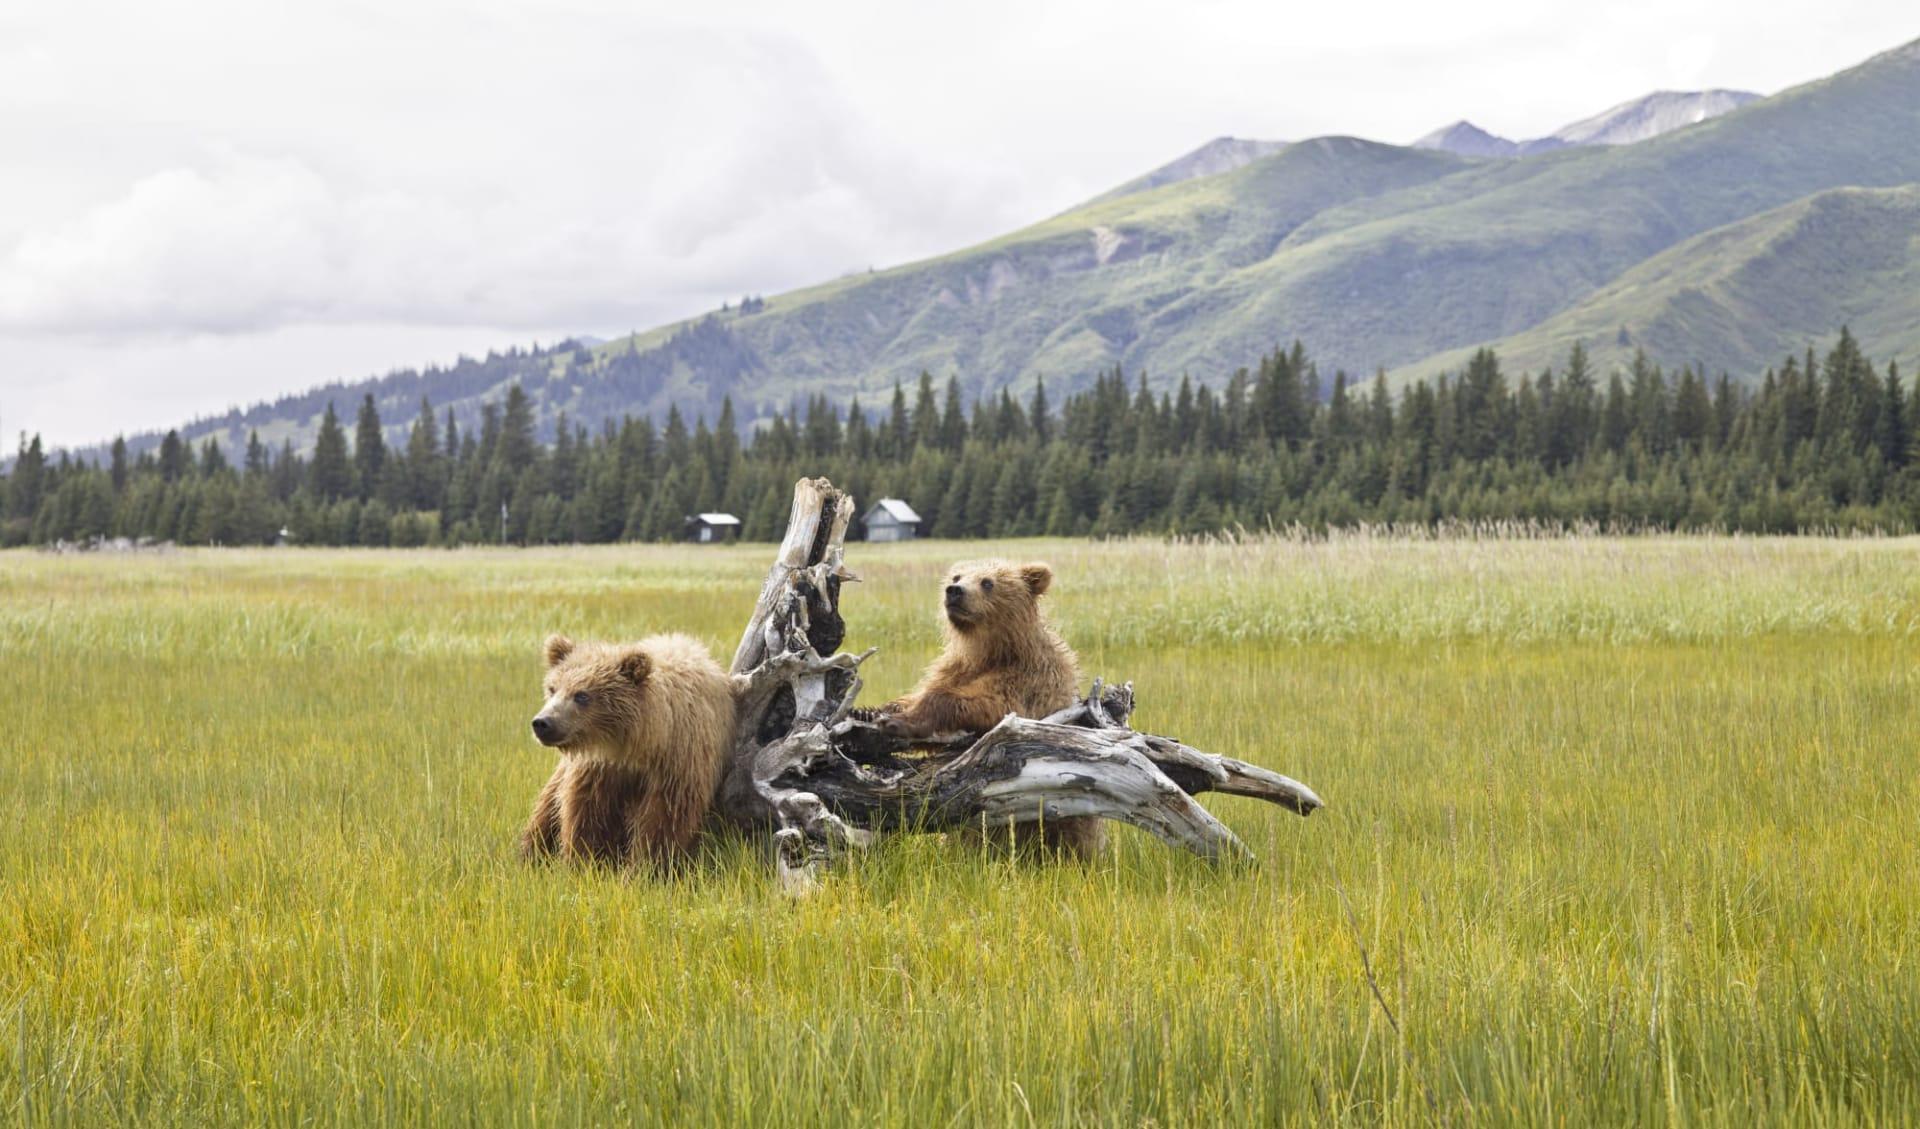 Bärenbeobachtung Redoubt Bay Lodge 3 Tage ab Anchorage: Alaska - Denali NP - Zwei spielende Bären